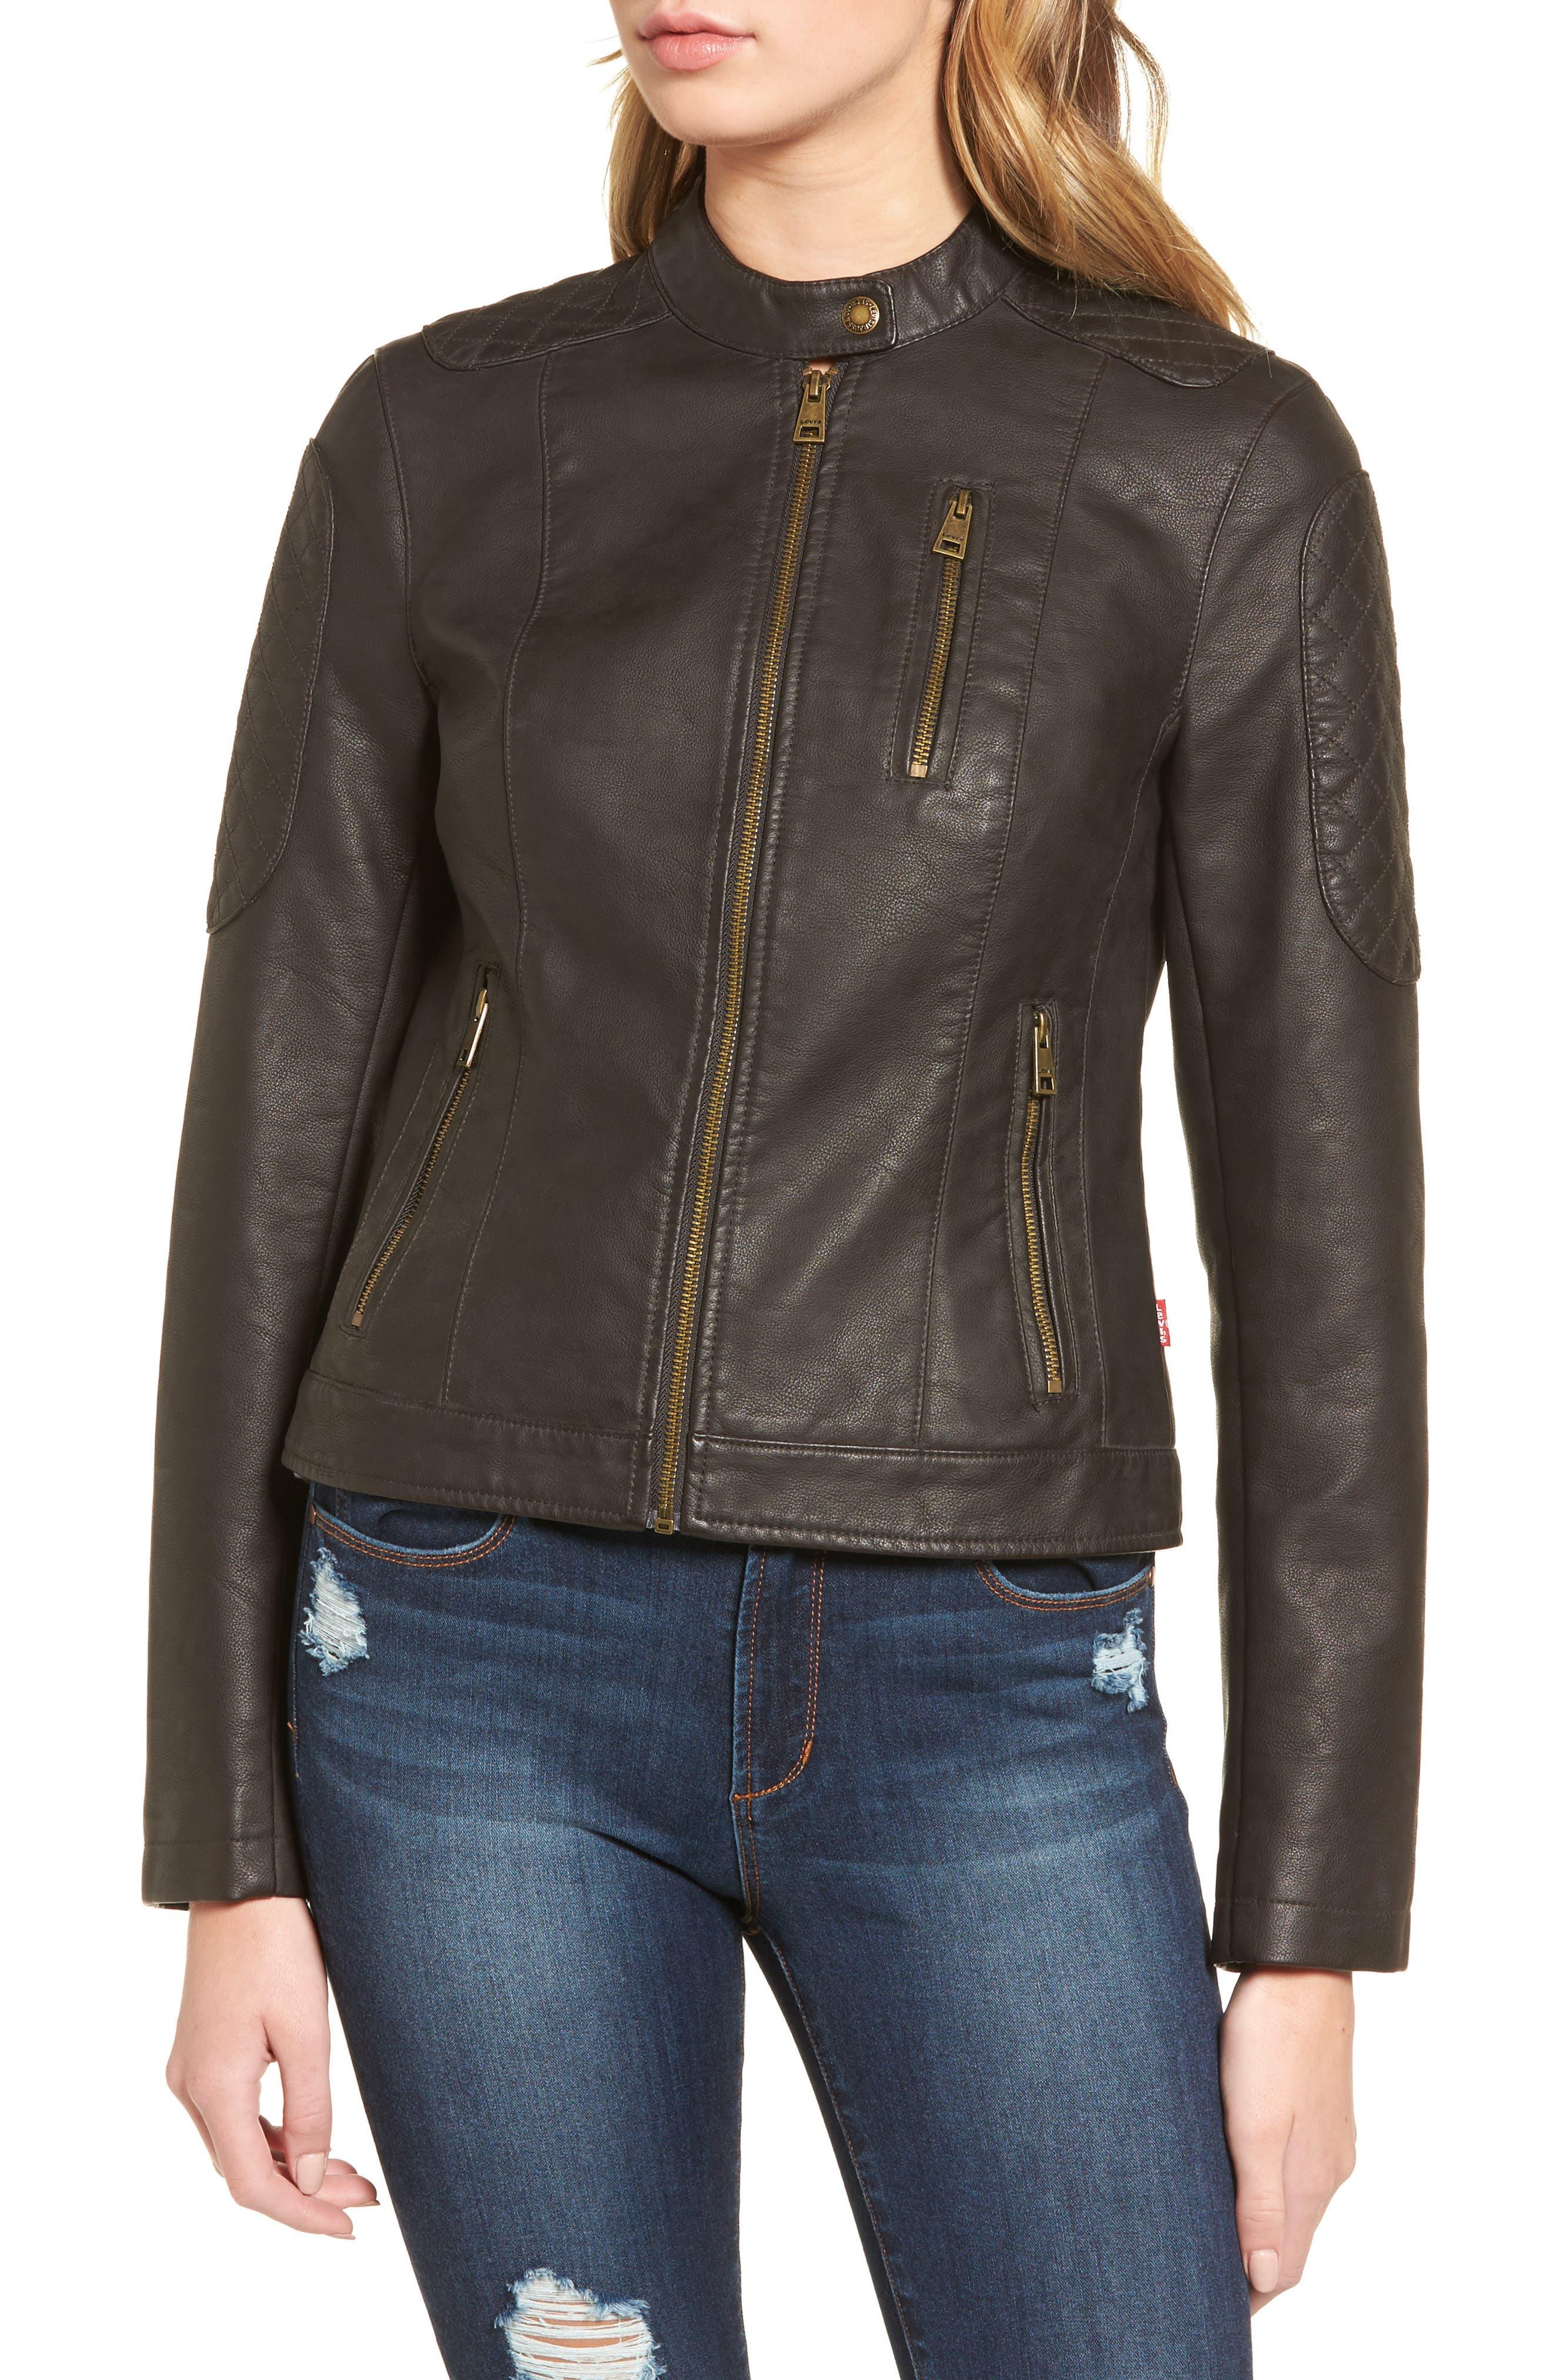 LEVIS<sup>®</sup> Faux Leather Moto Jacket,                             Alternate thumbnail 4, color,                             Brown